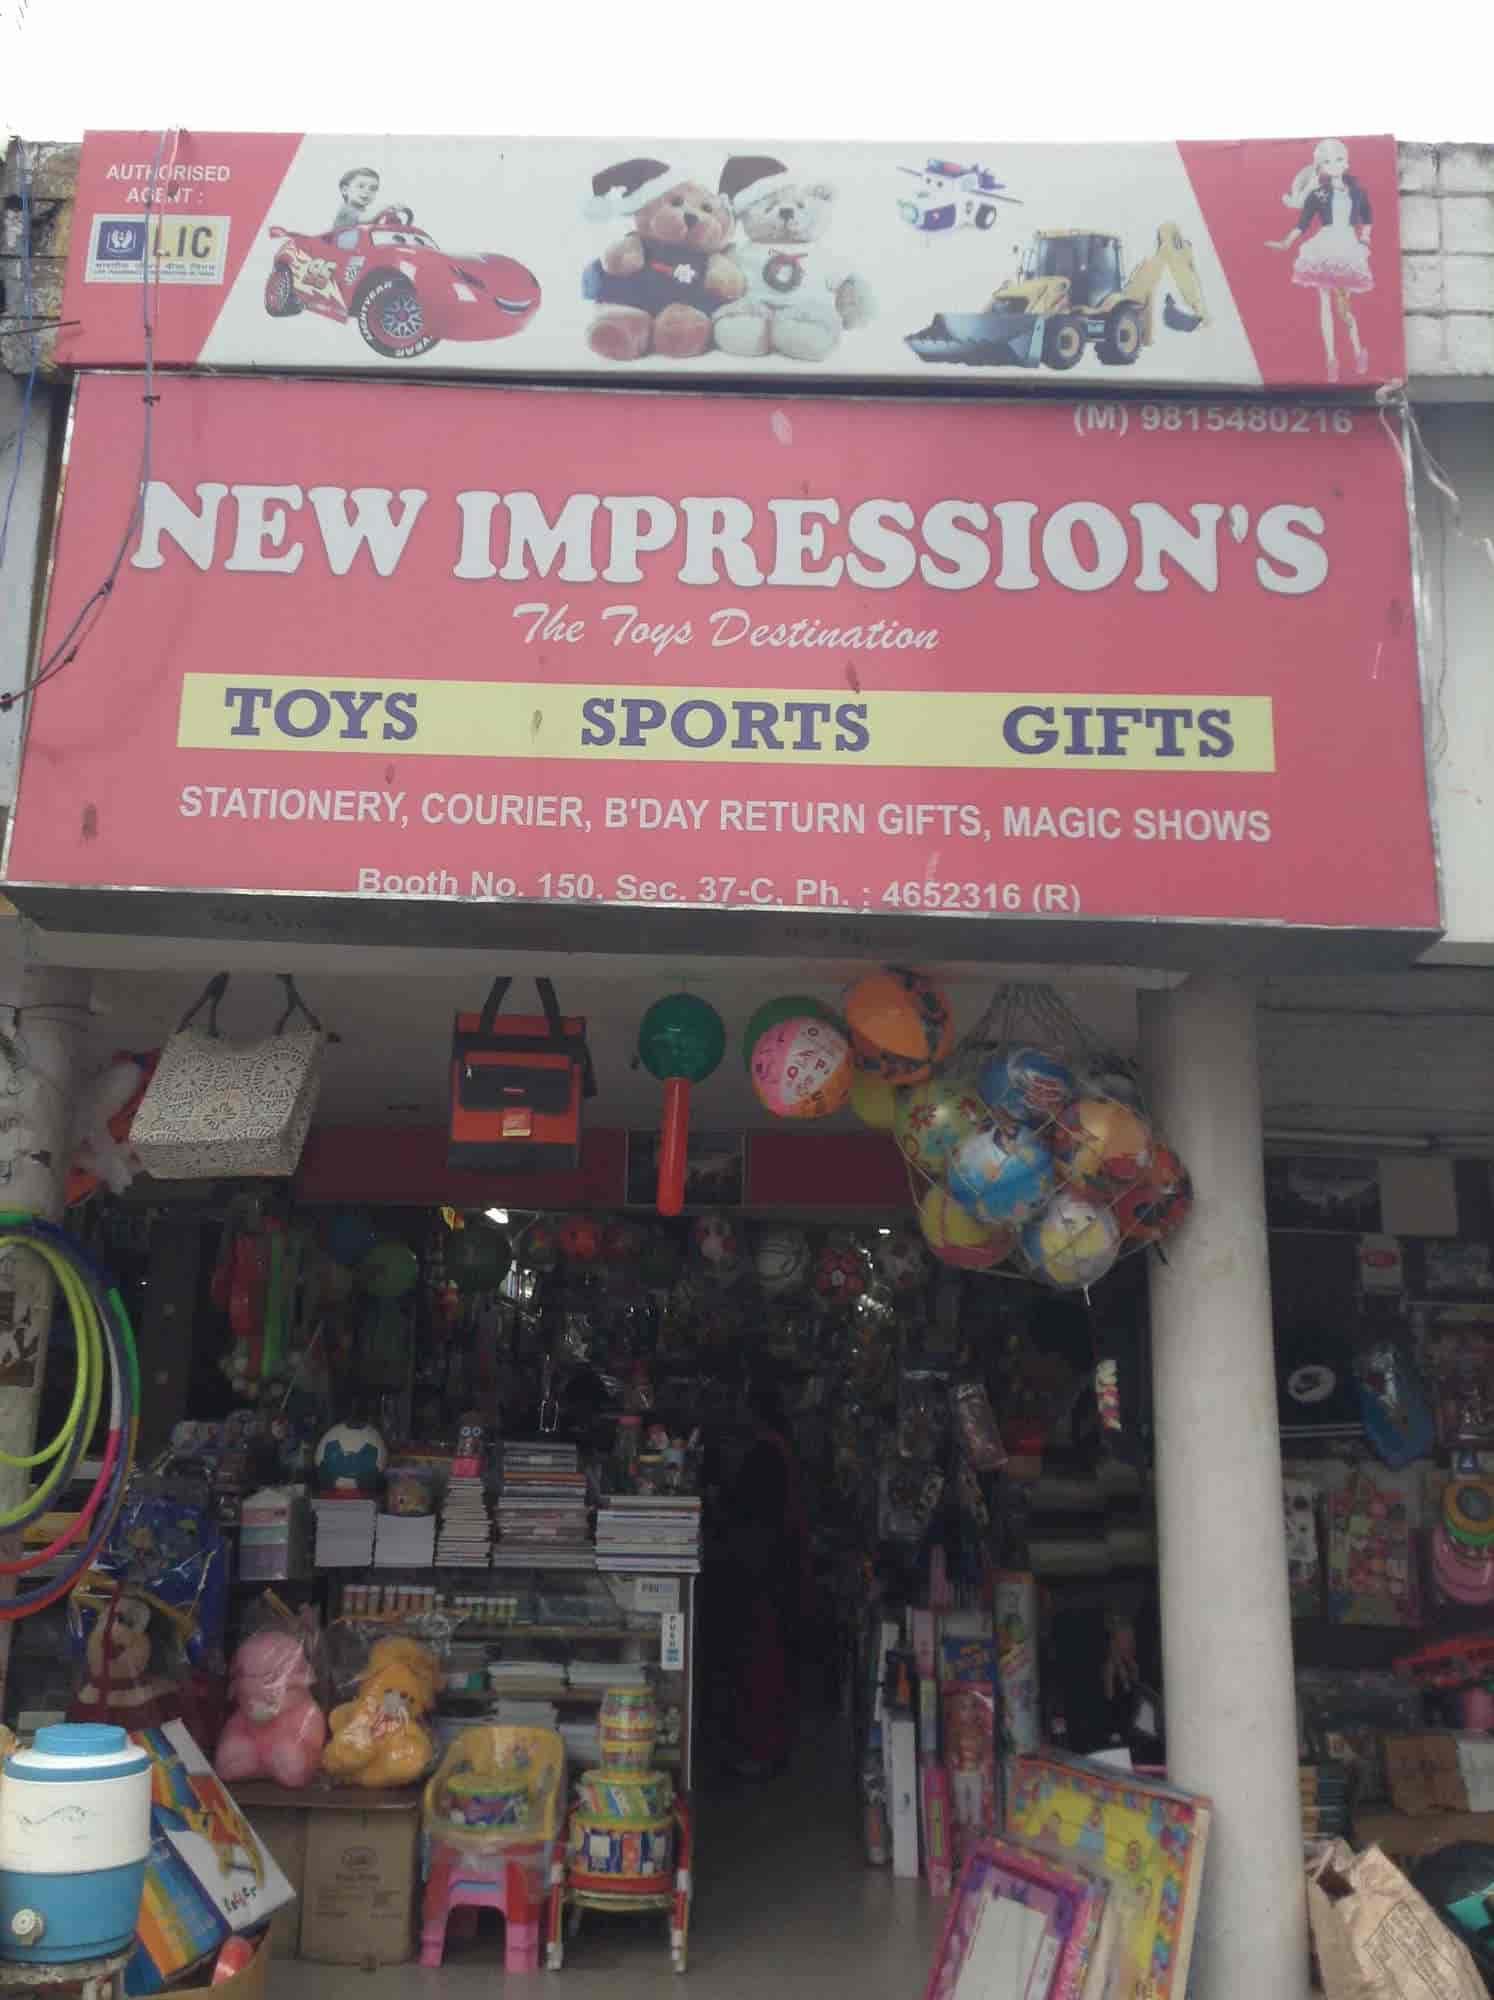 New Impression Gift Shop Photos, Chandigarh Sector 37c, Chandigarh ...